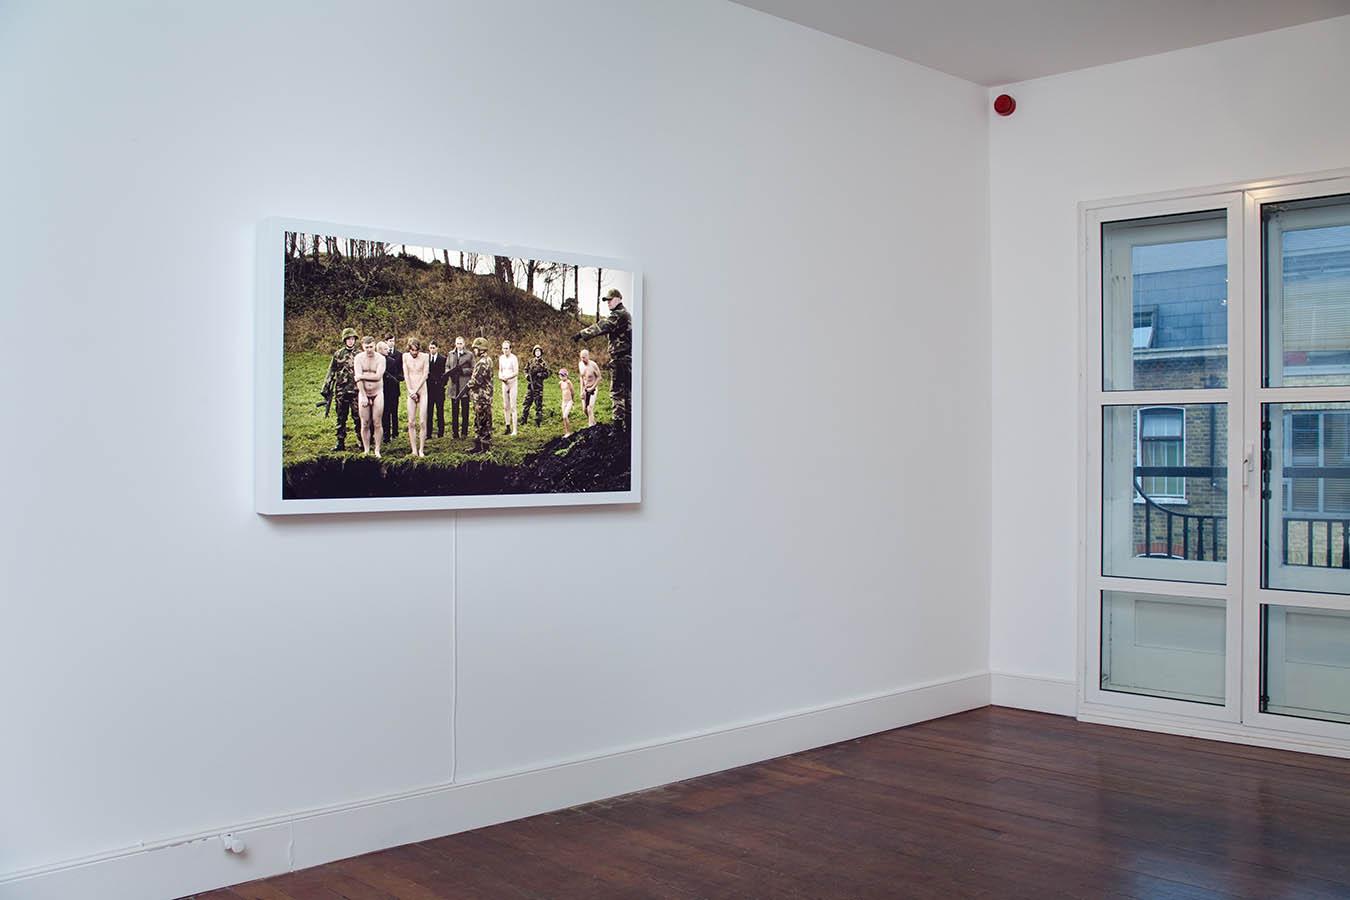 Svein Moxvold work documentation - Charlie Smith Gallery, London